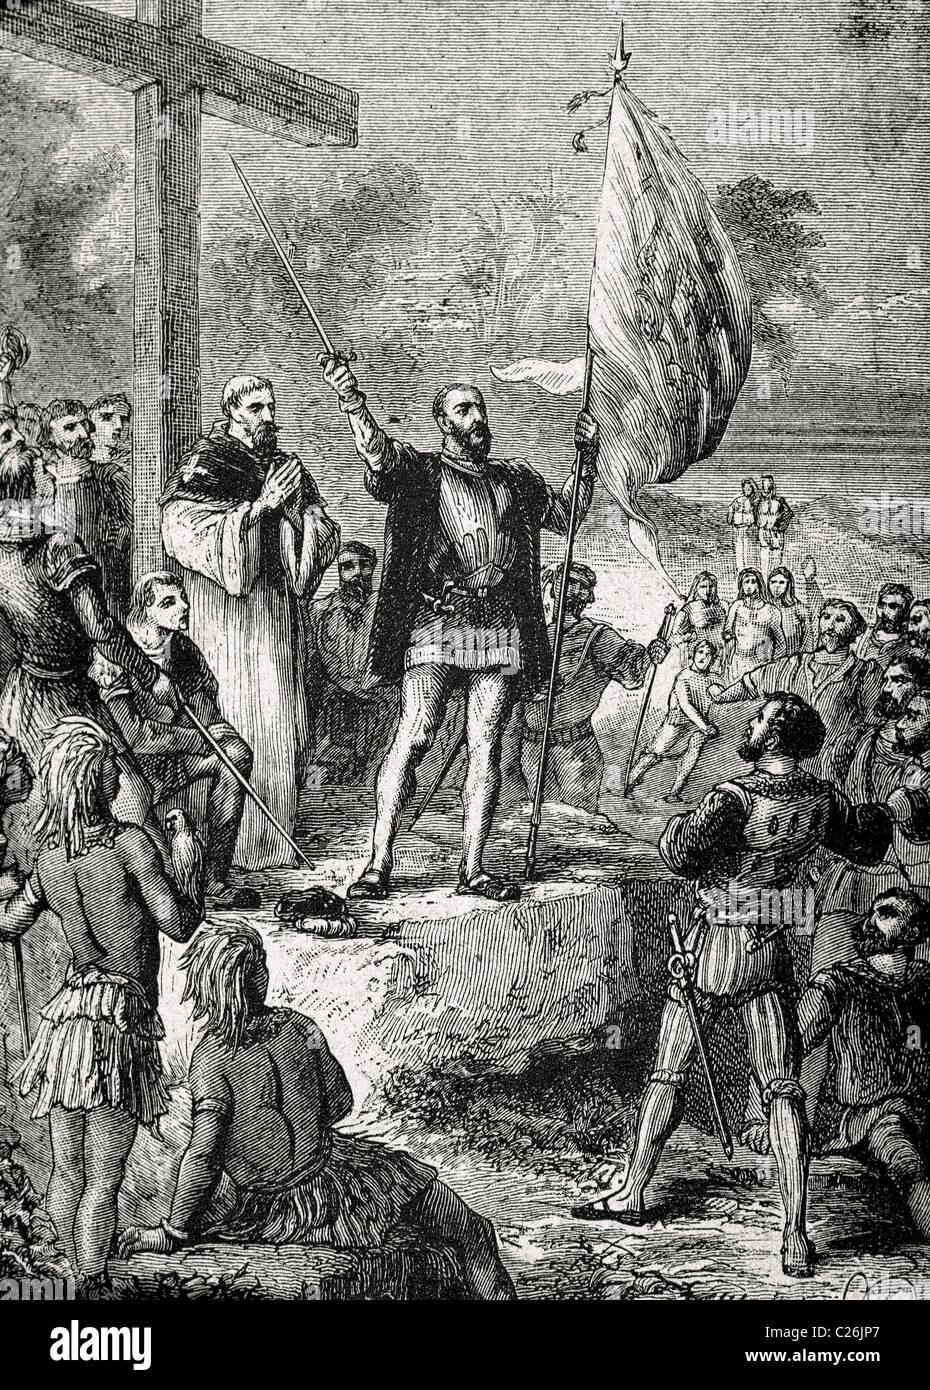 Pedro Alvares Cabral (ca.1467-1520). Cabral took possession of Brazil. - Stock Image